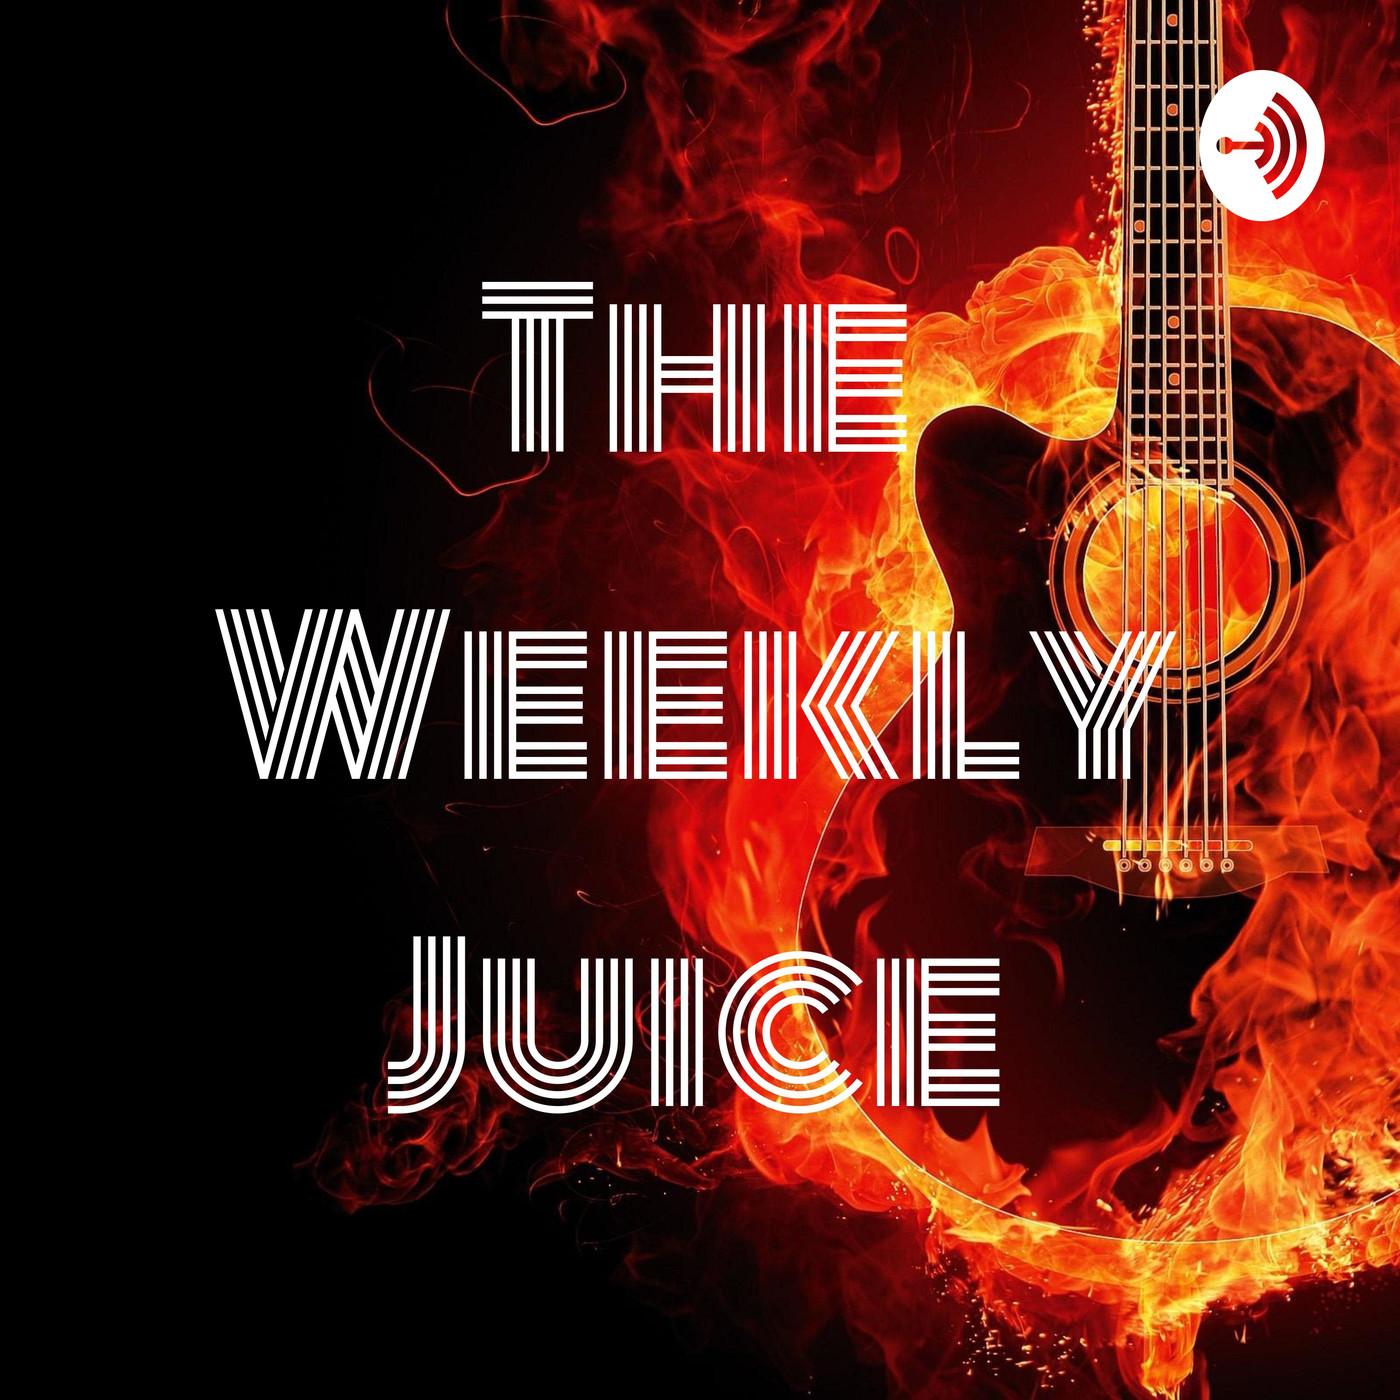 Your Weekly Juice October 19, 2020